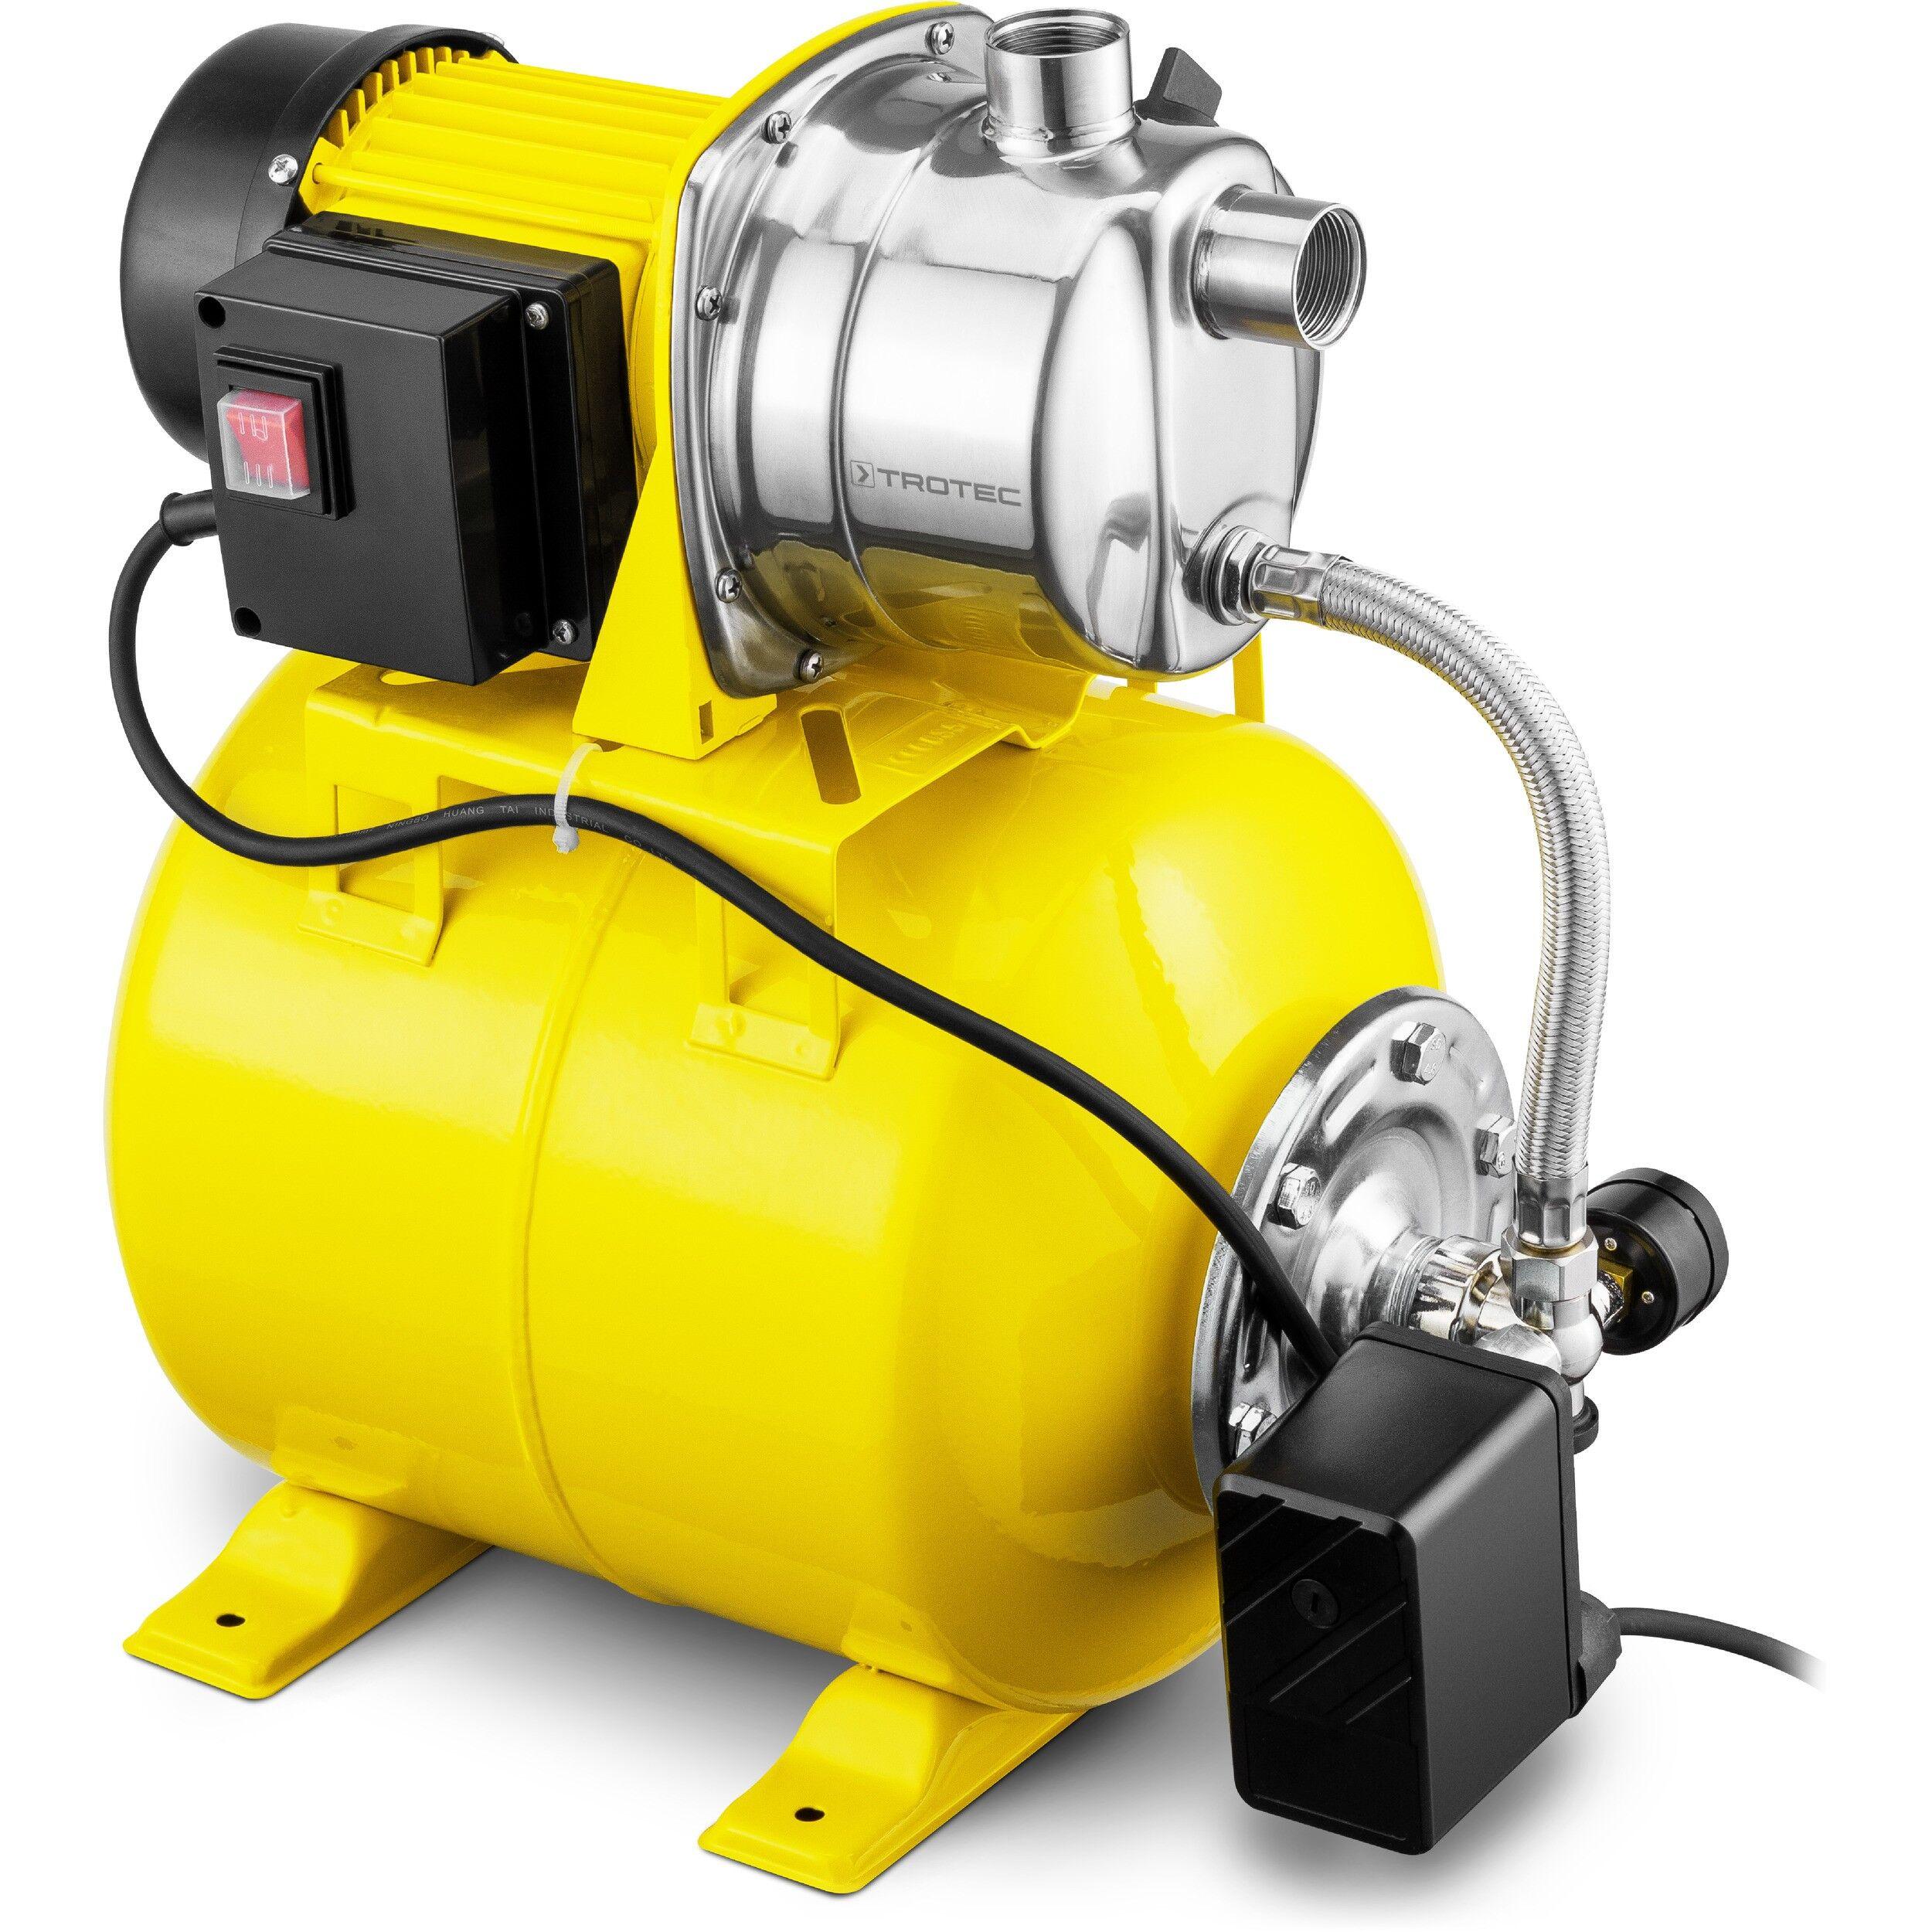 Trotec Pompa autoclave per uso domestico TGP 1025 ES